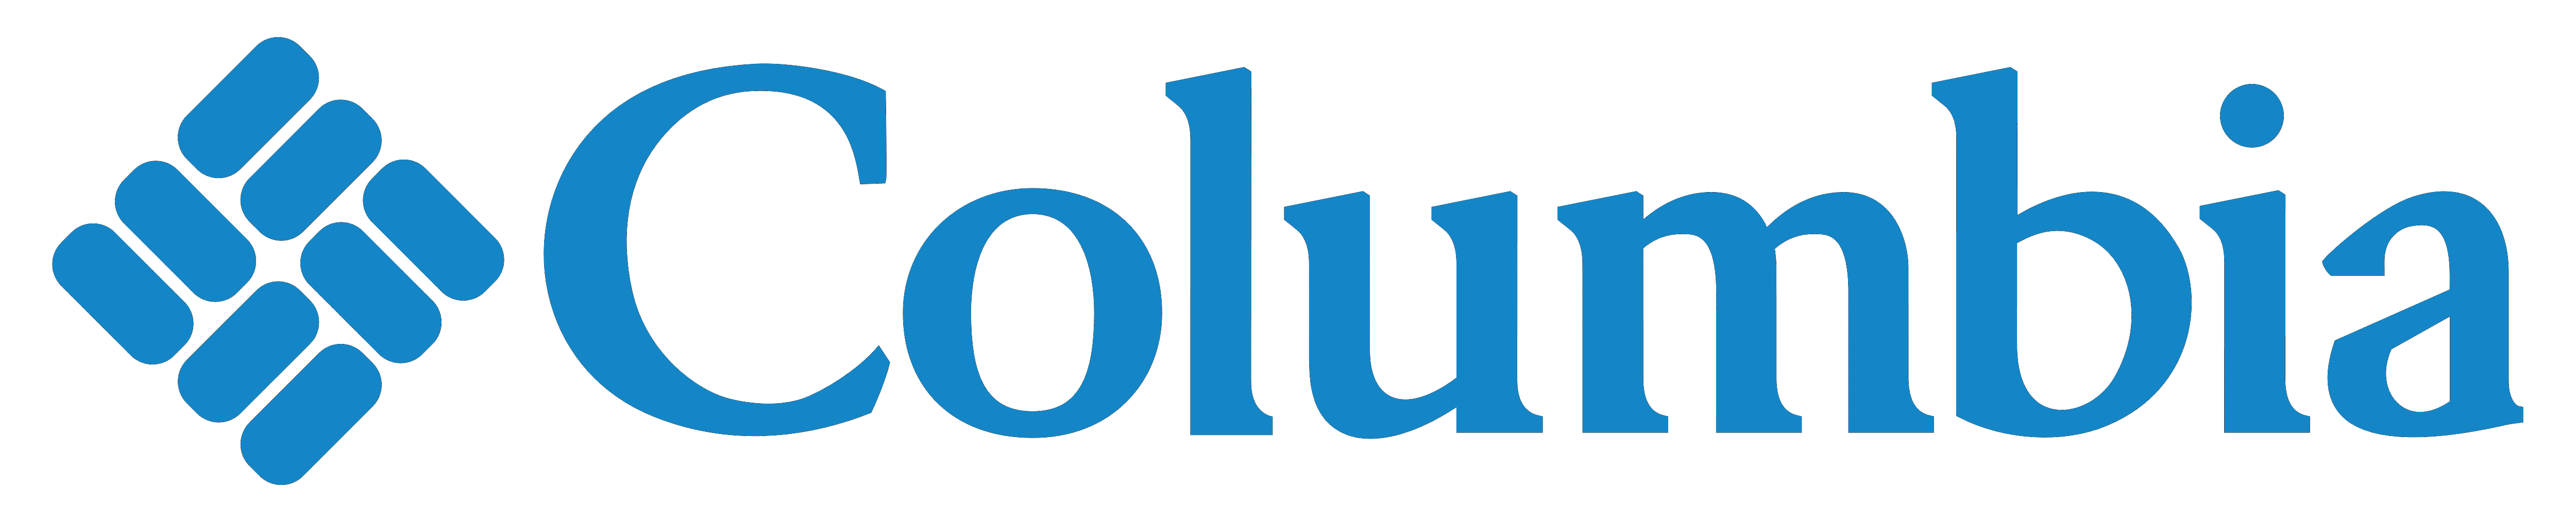 columbia-logo-1.png